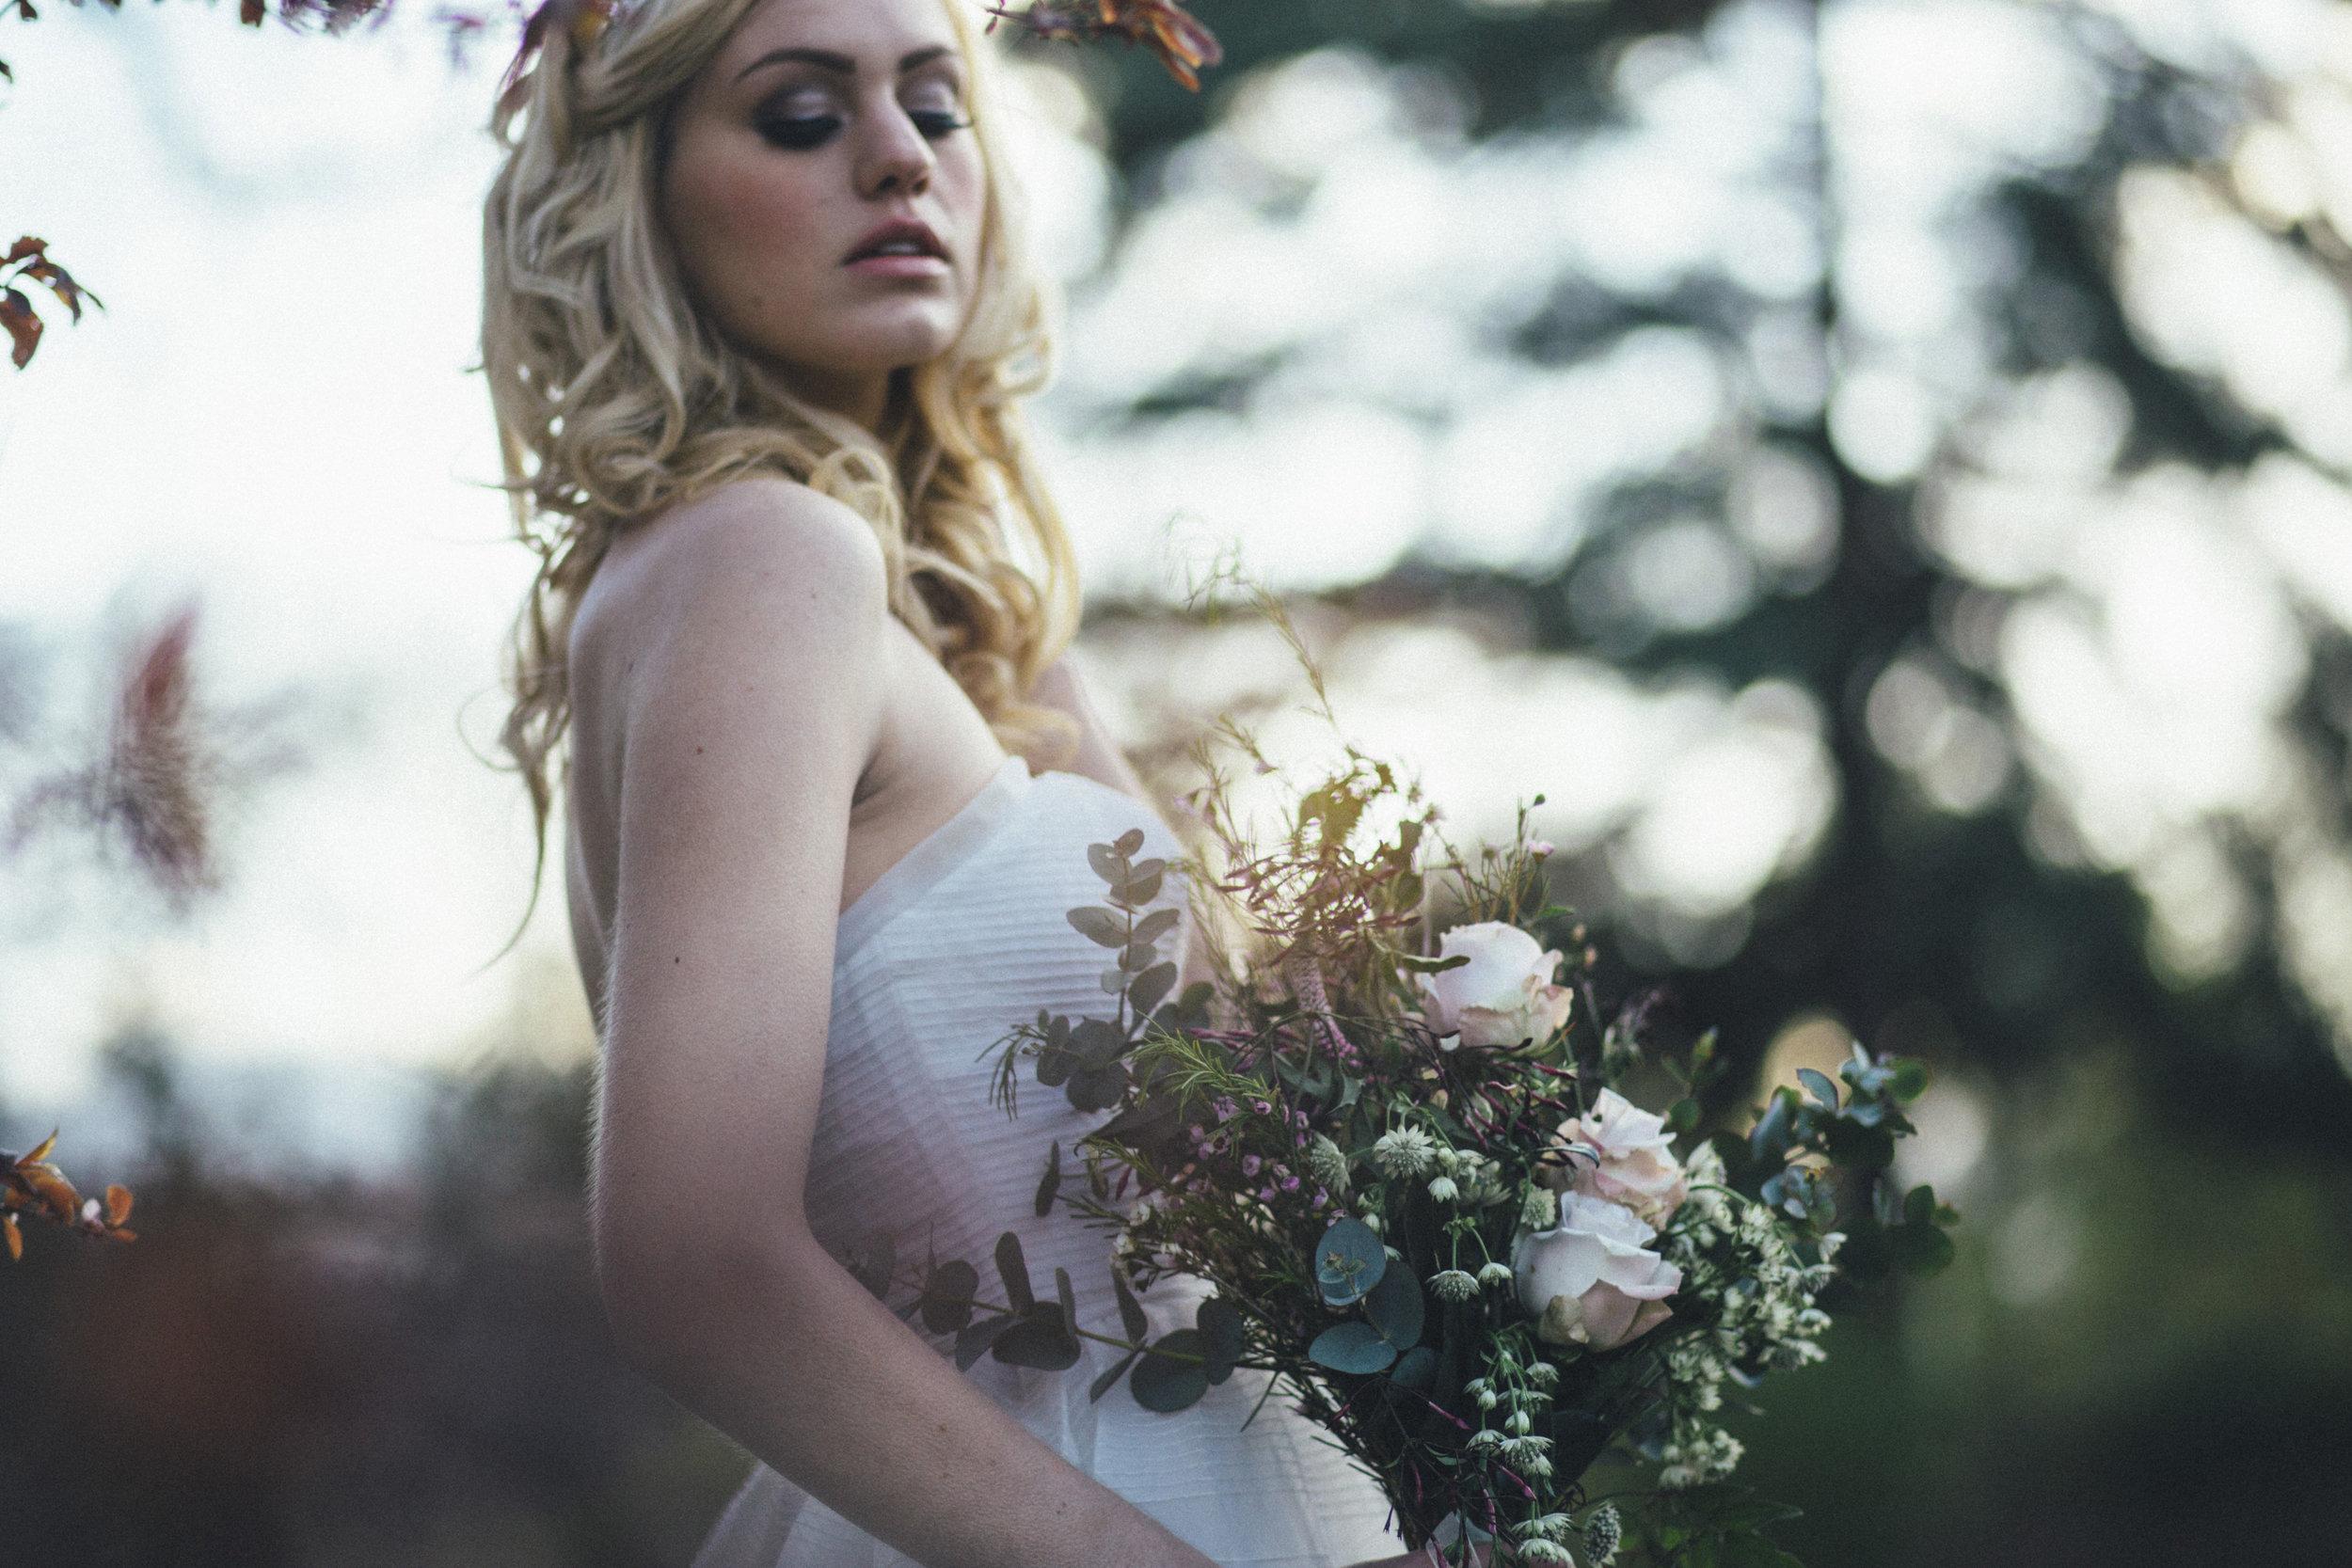 Spring-Bridal-Kate-Beaumont-Shelley-Richmond-Vintage-Wedding-Dress-23.jpg